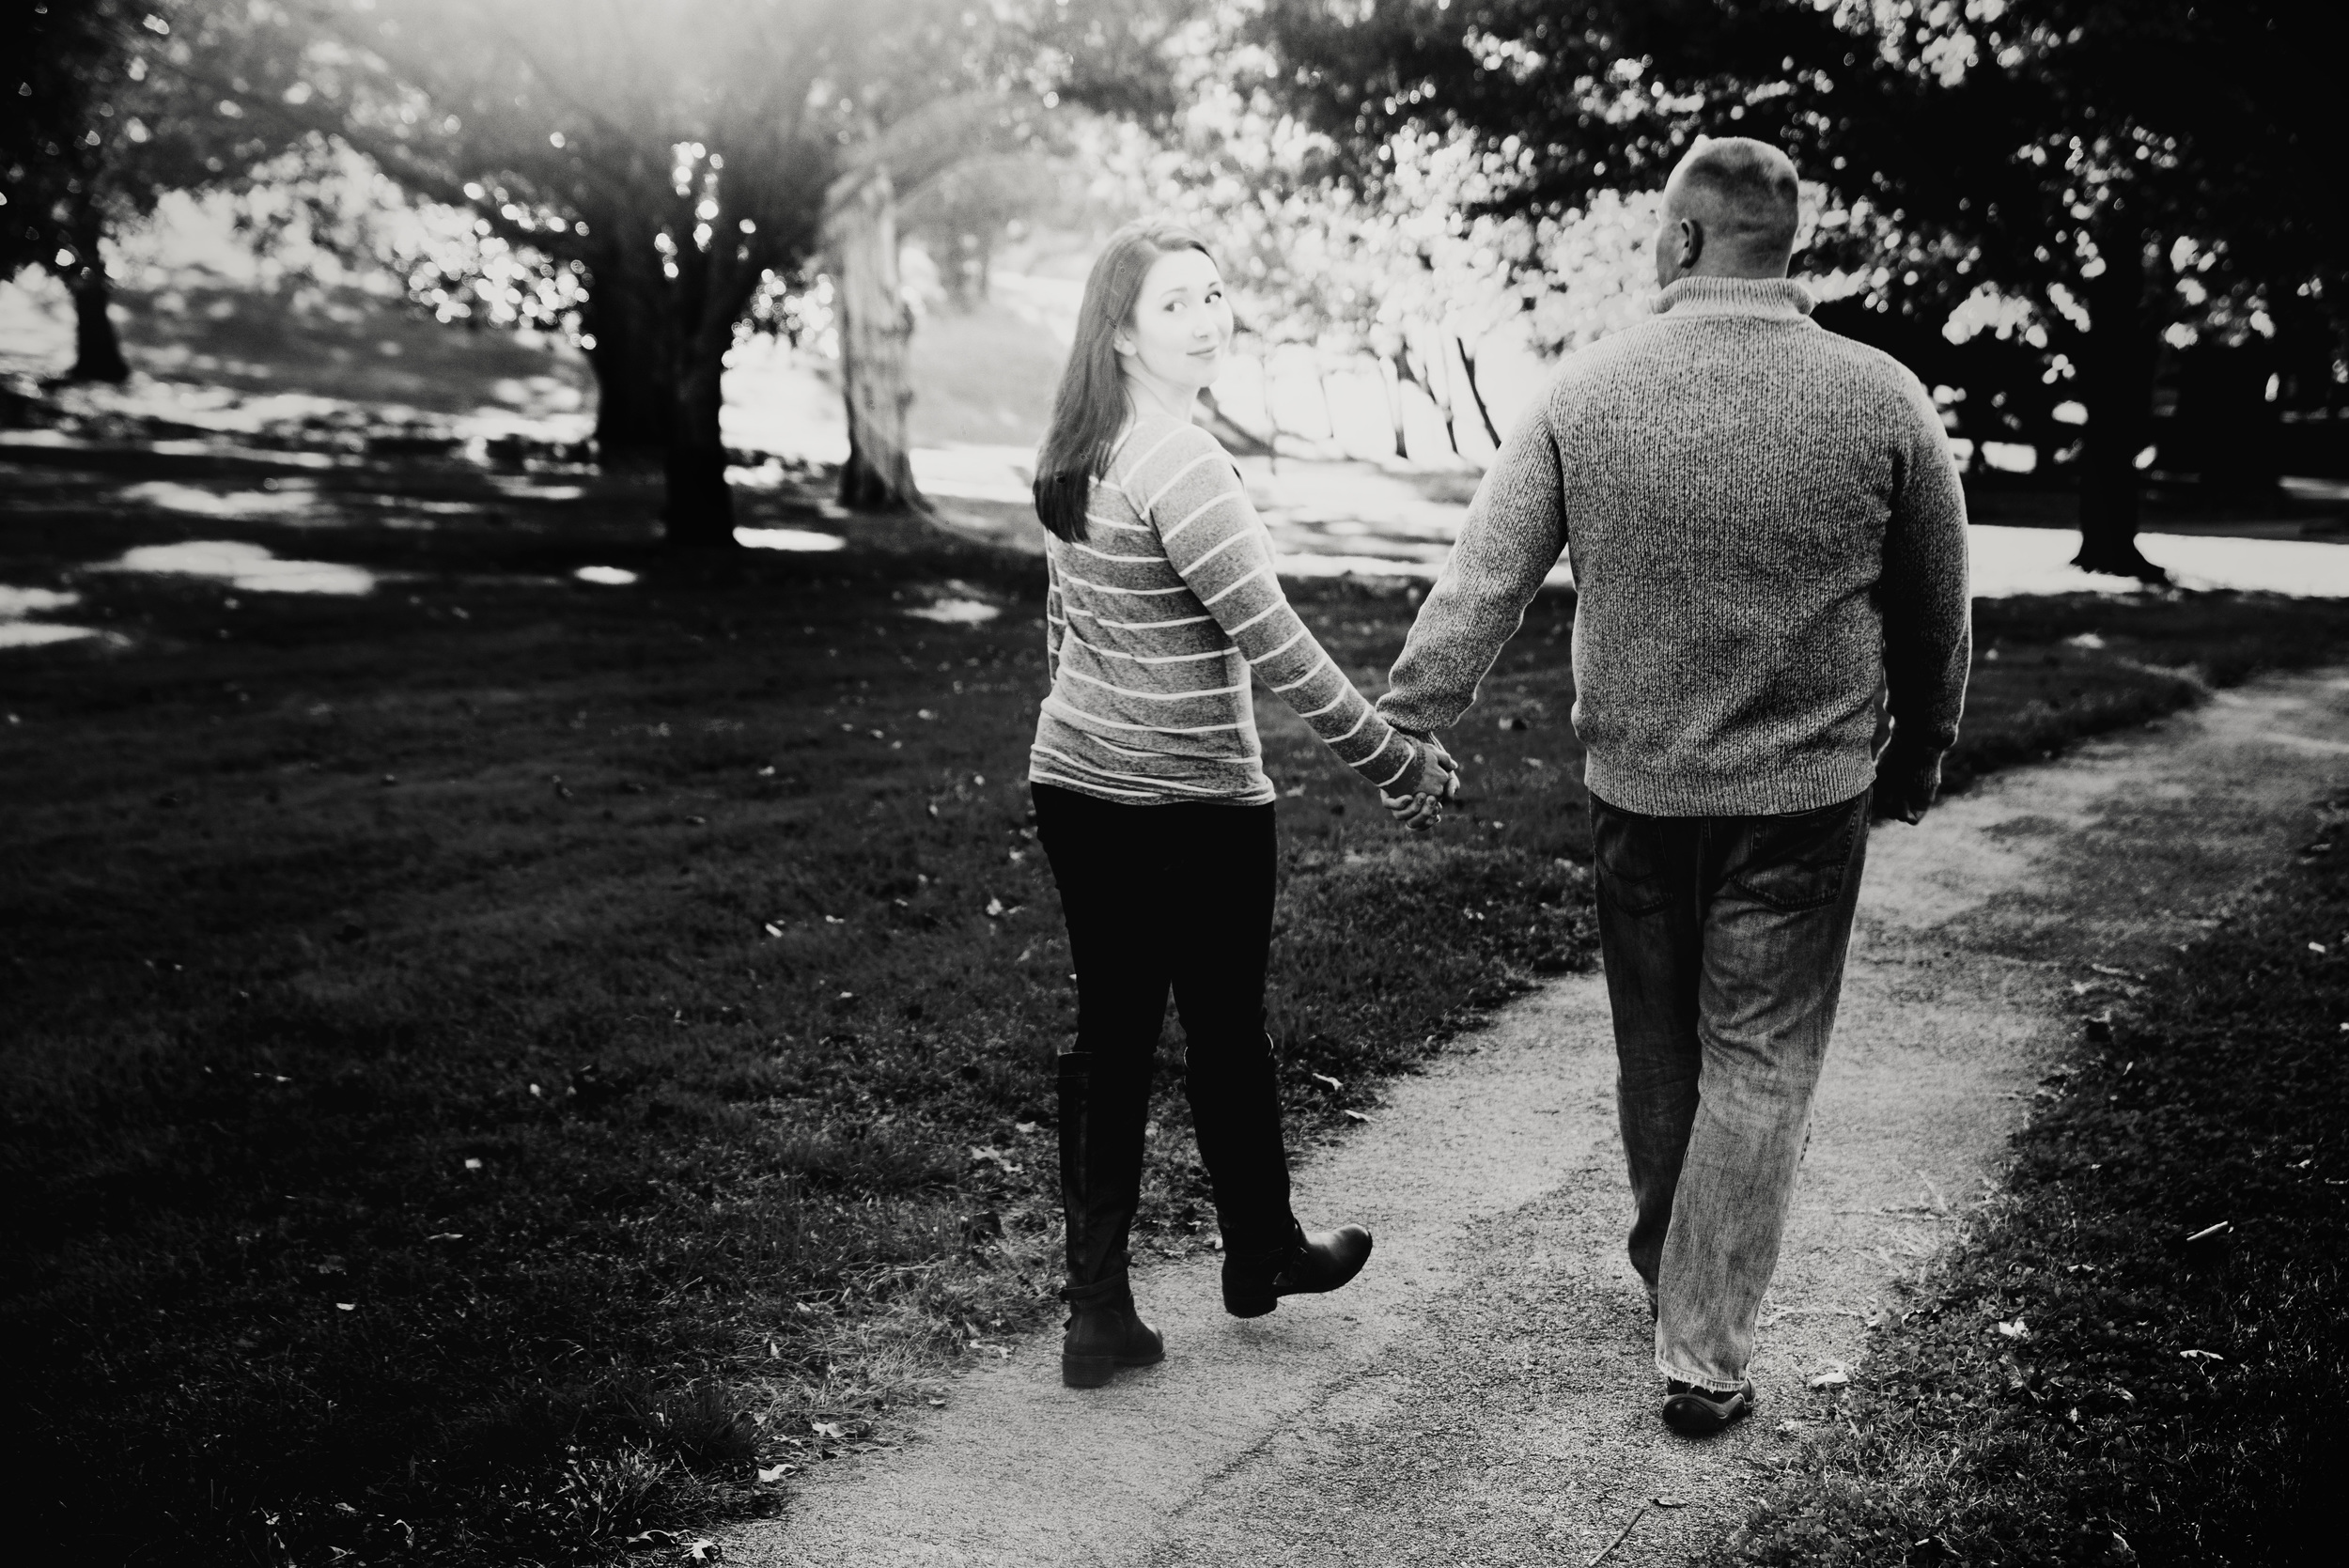 fall_romantic_park_engagement_session_lynchburg_va003.jpg